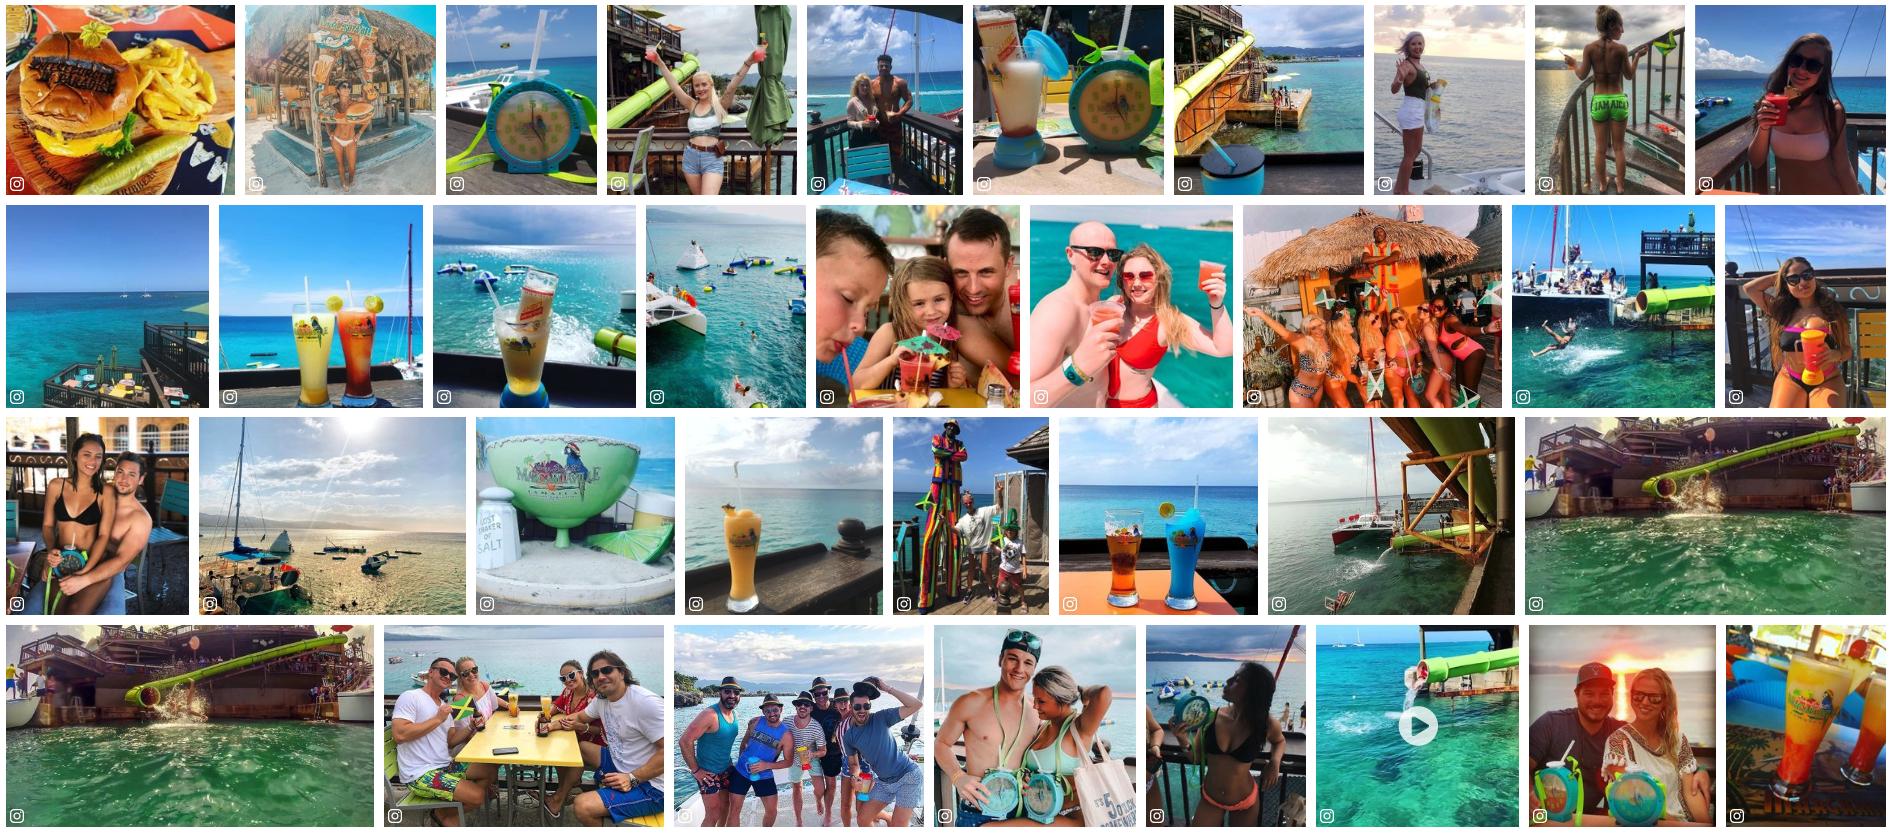 Margaritaville Caribbean Montego Bay image gallery